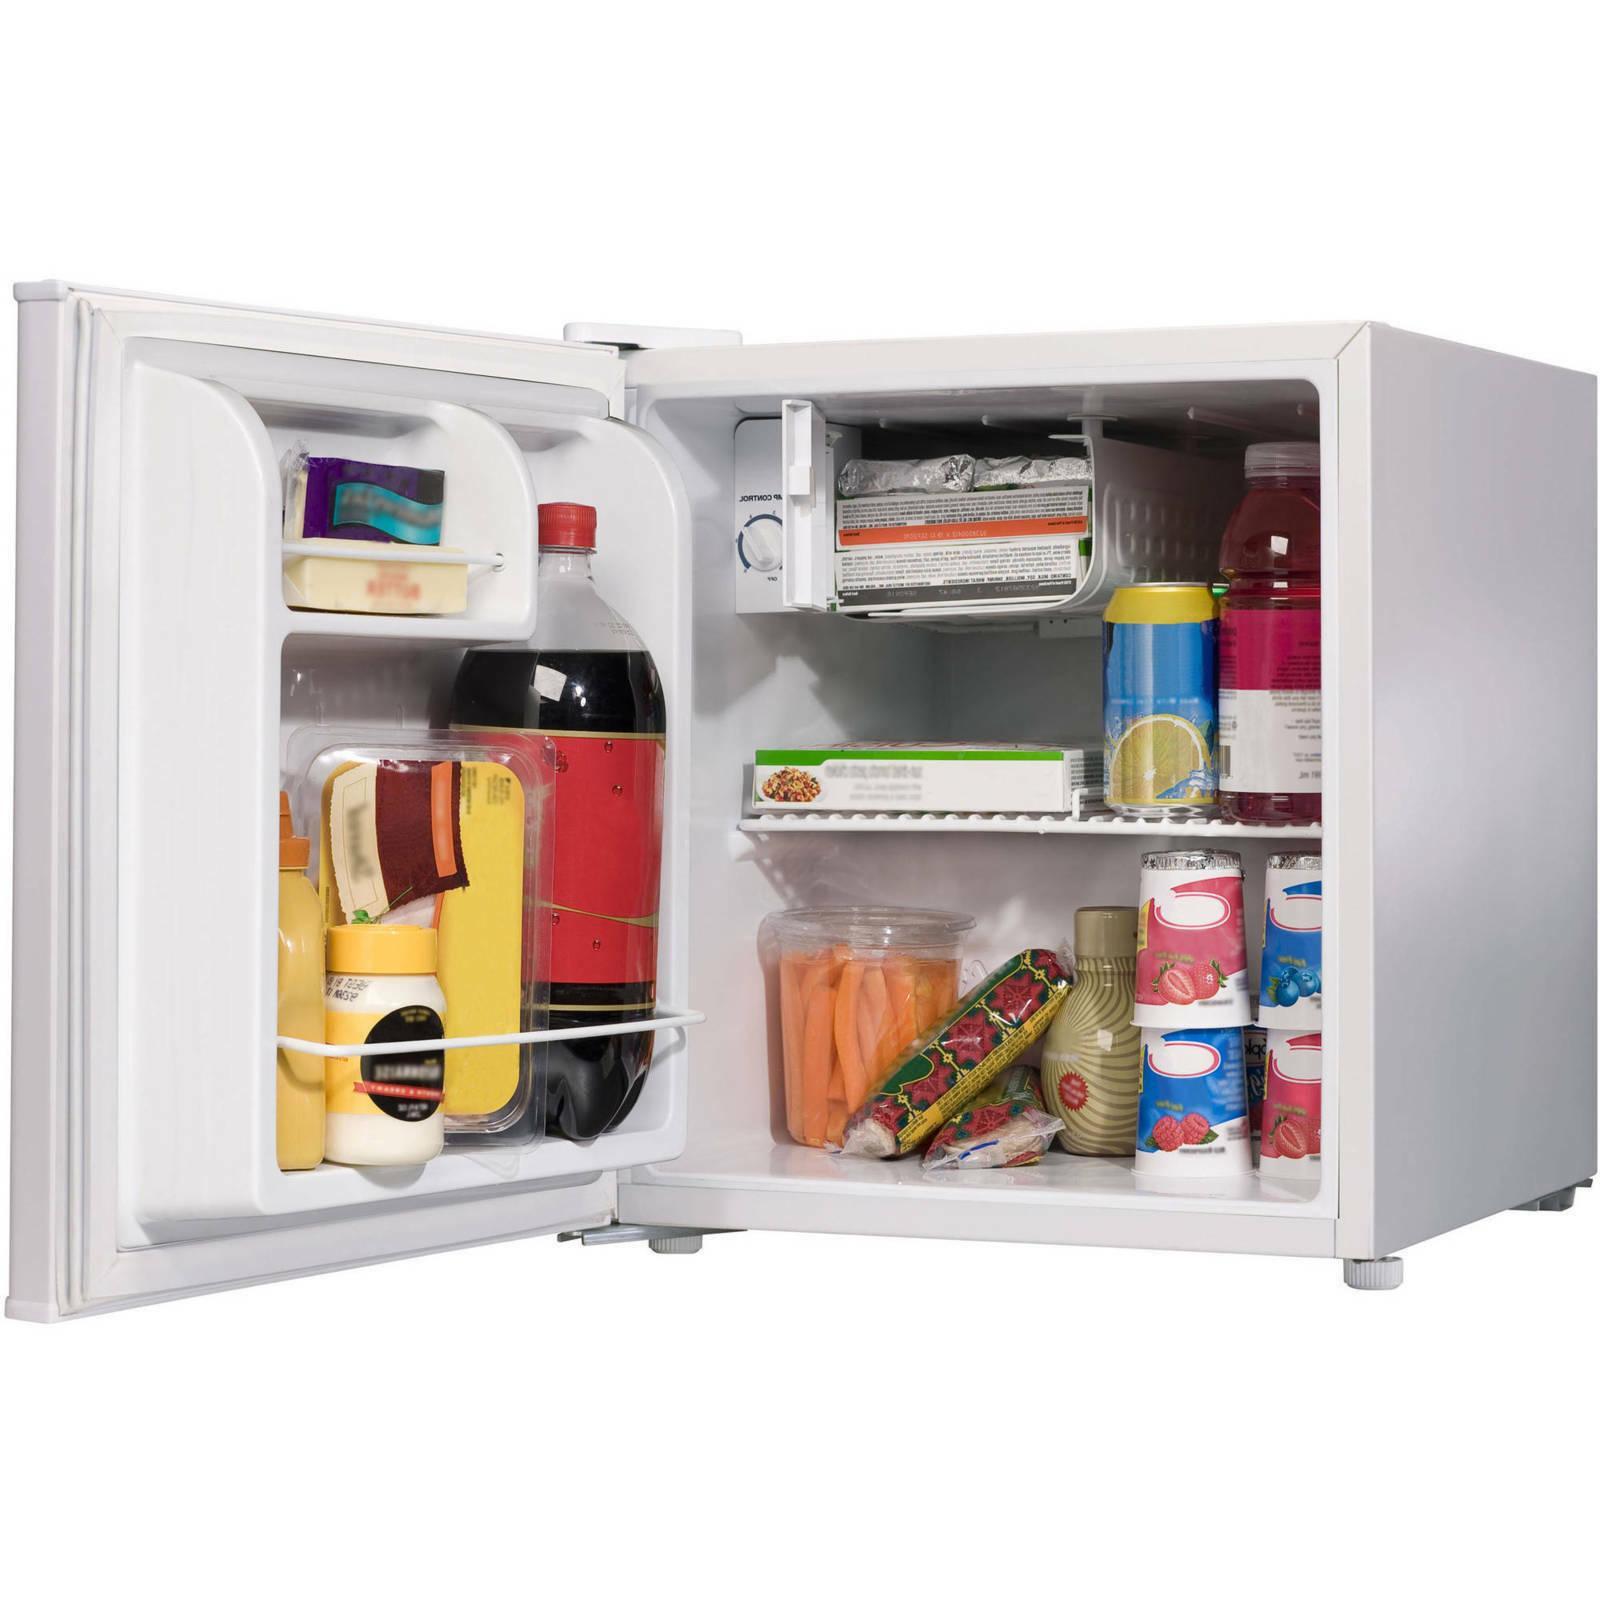 Mini Fridge Compact Refrigerator 1.7 Cu